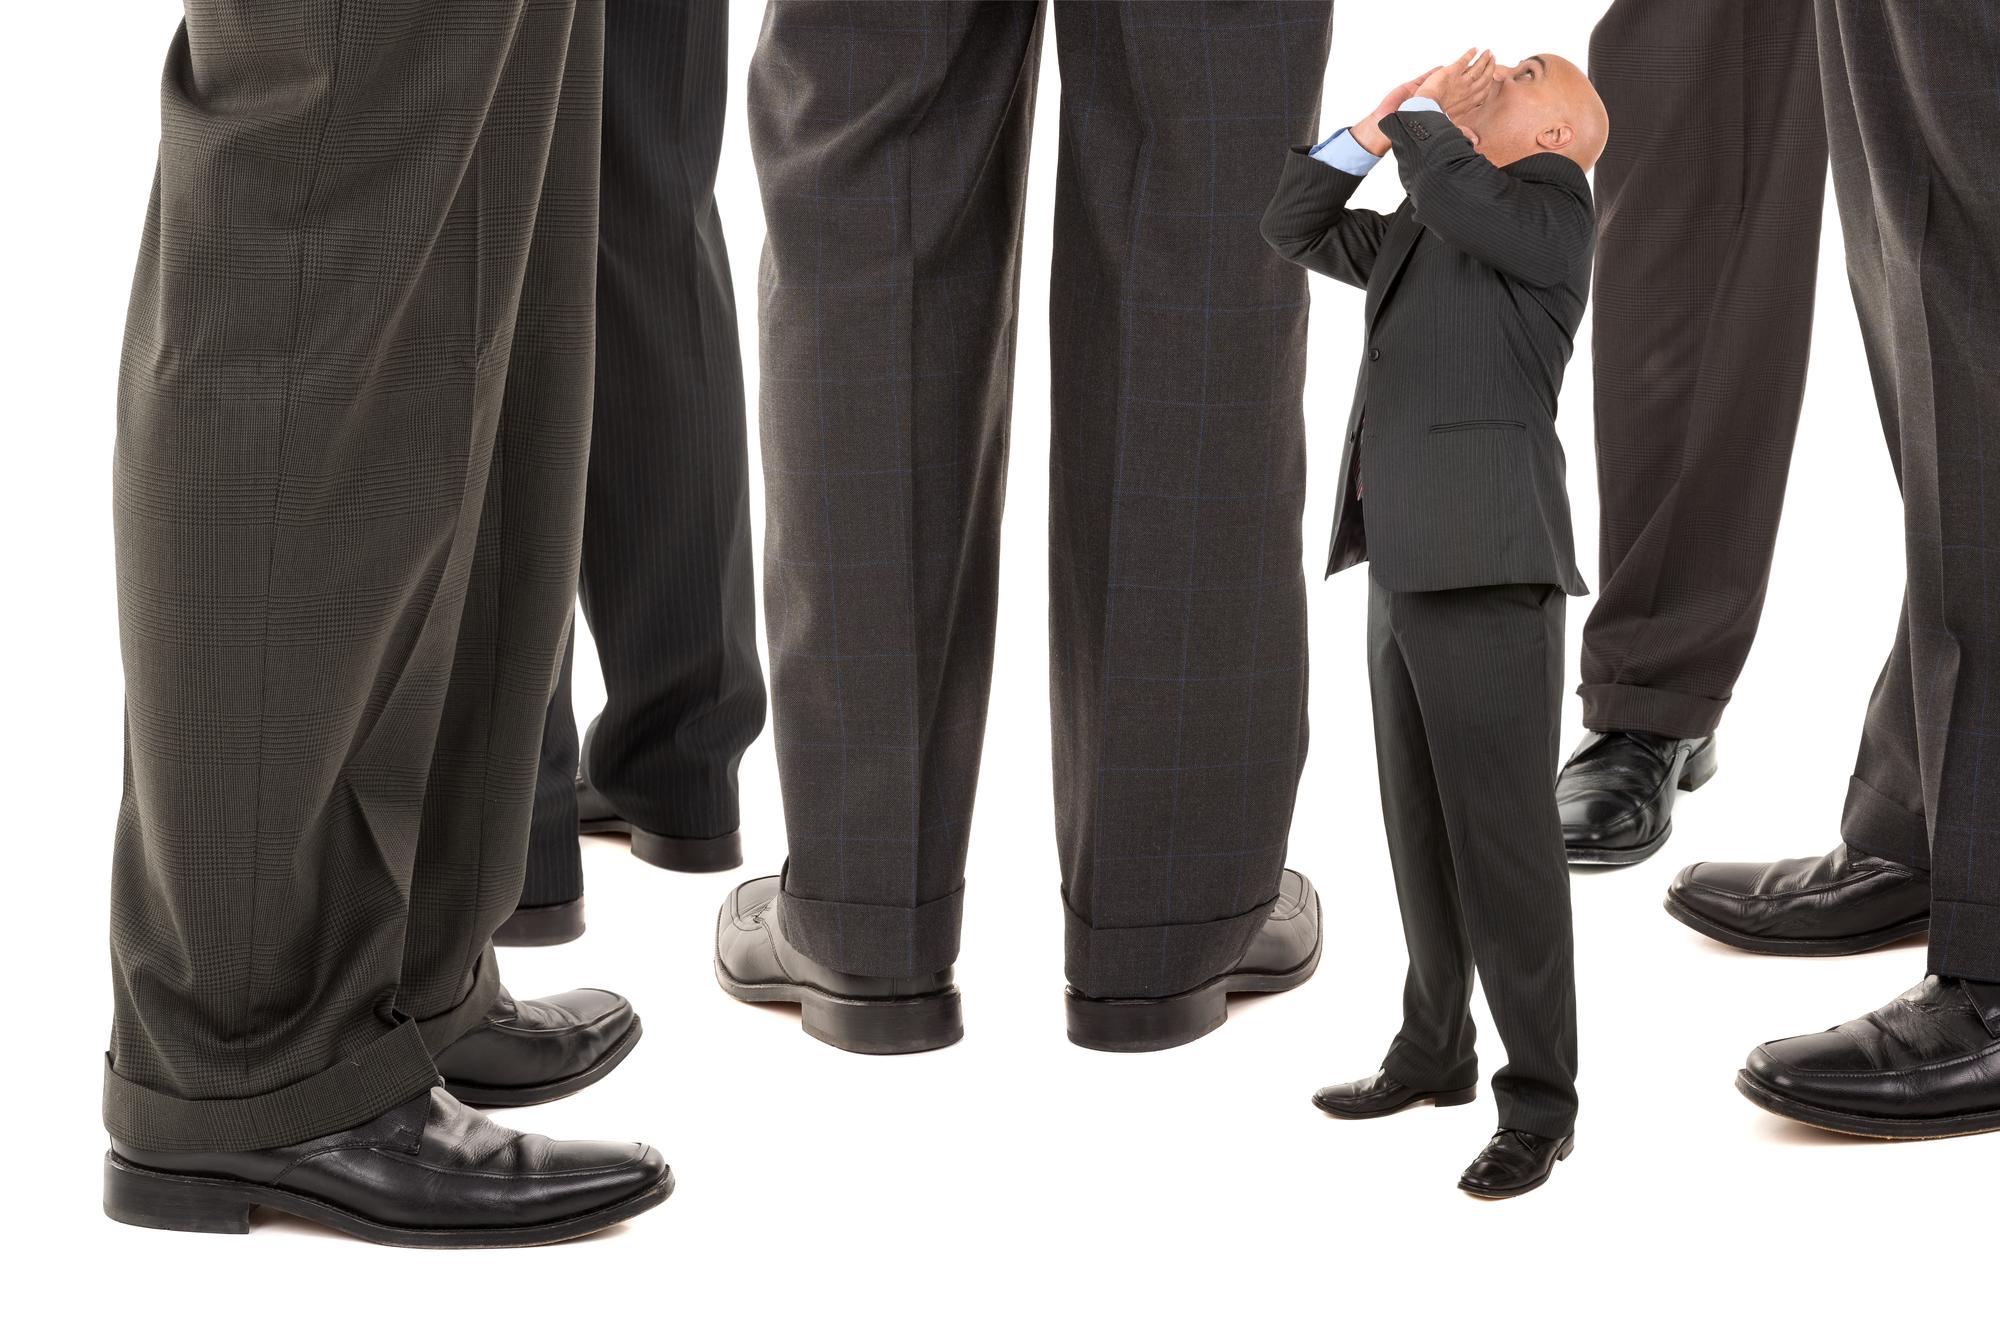 Small businessman needs confidence.